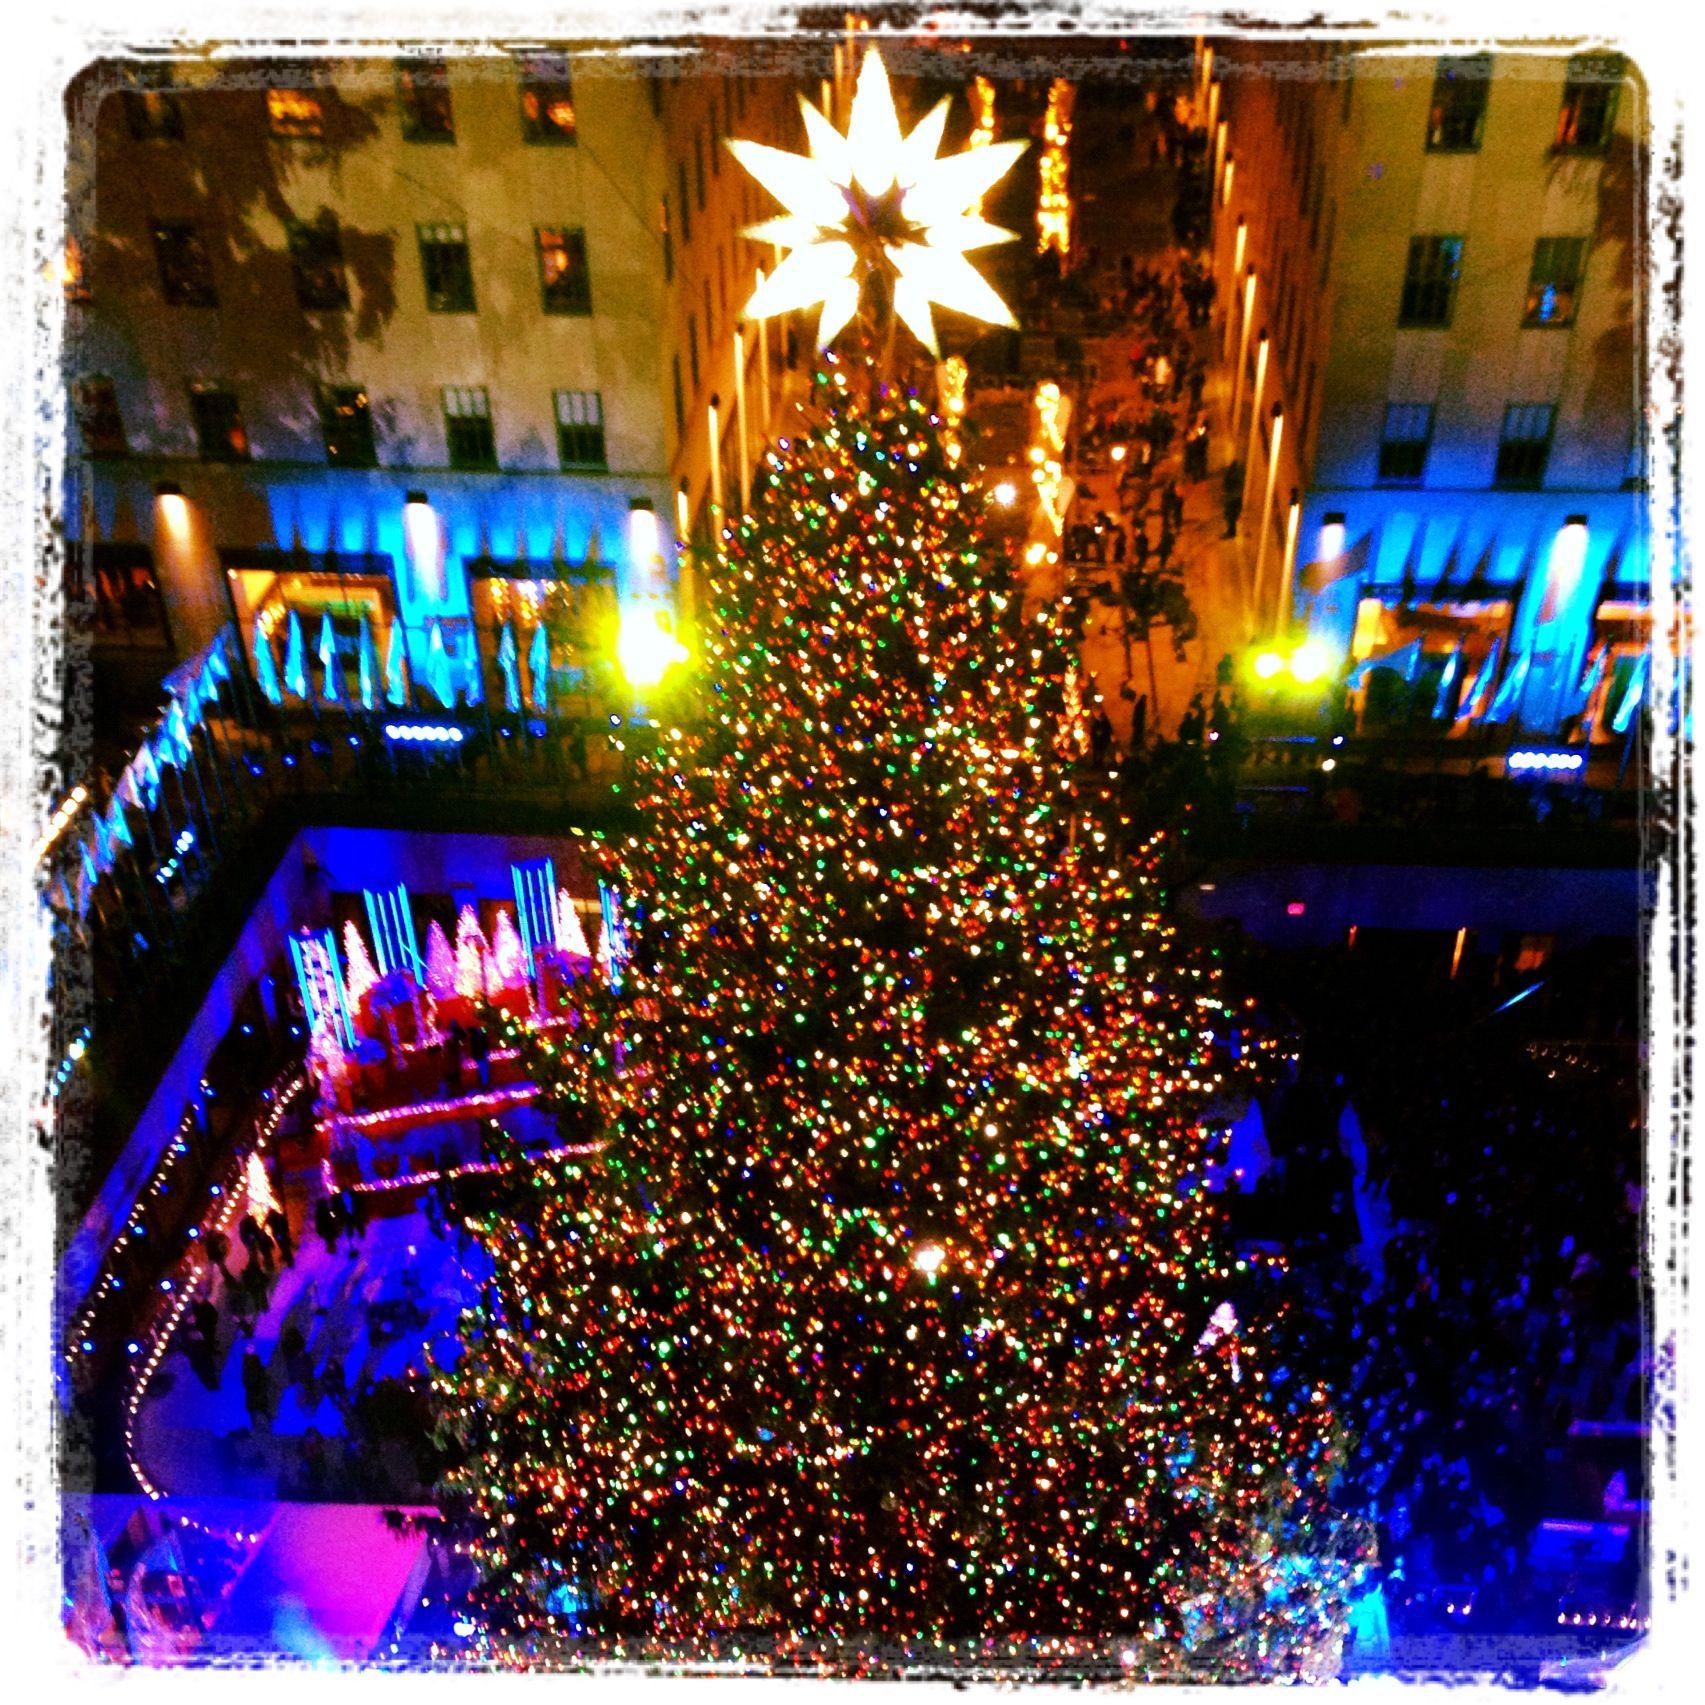 Rockefeller Center Christmas tree lighting! Love working at NBC